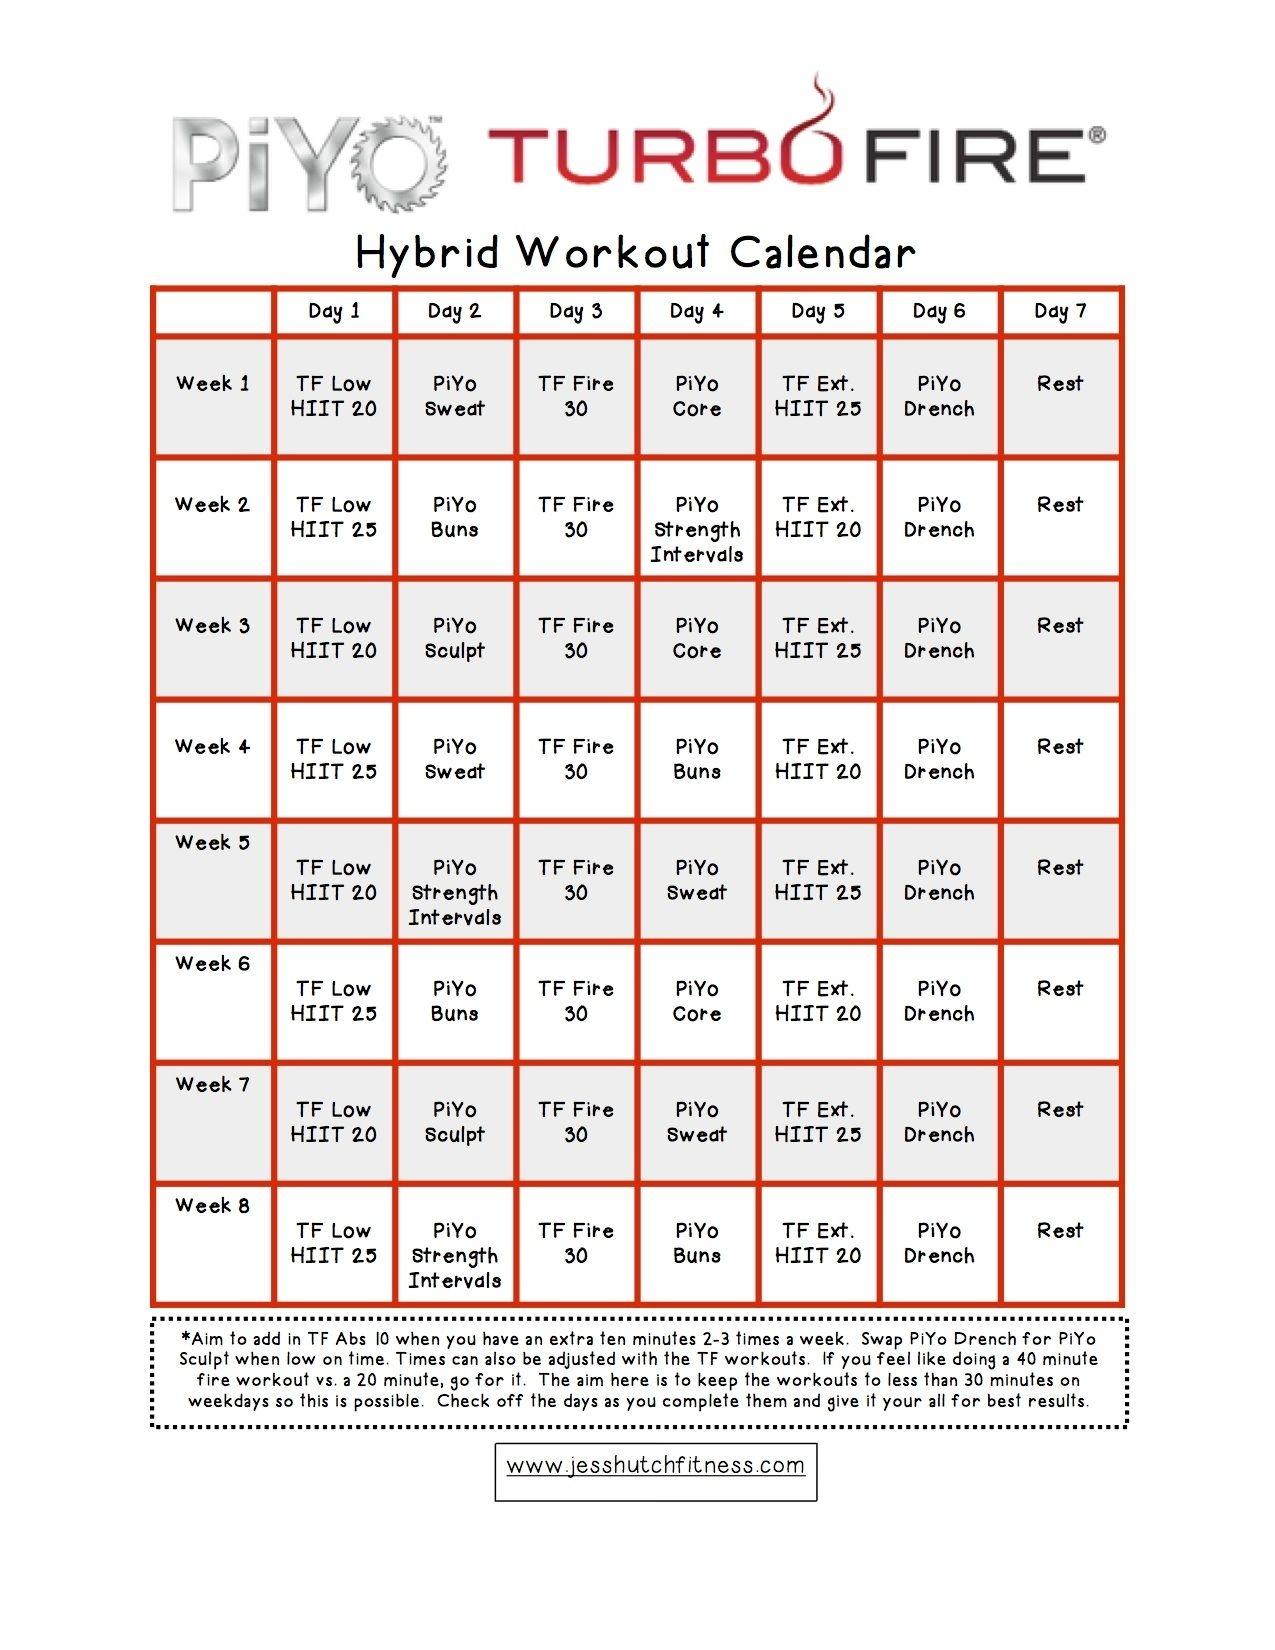 Piyo/turbofire Hybrid Calendar | Workout Calendar, Body Pump